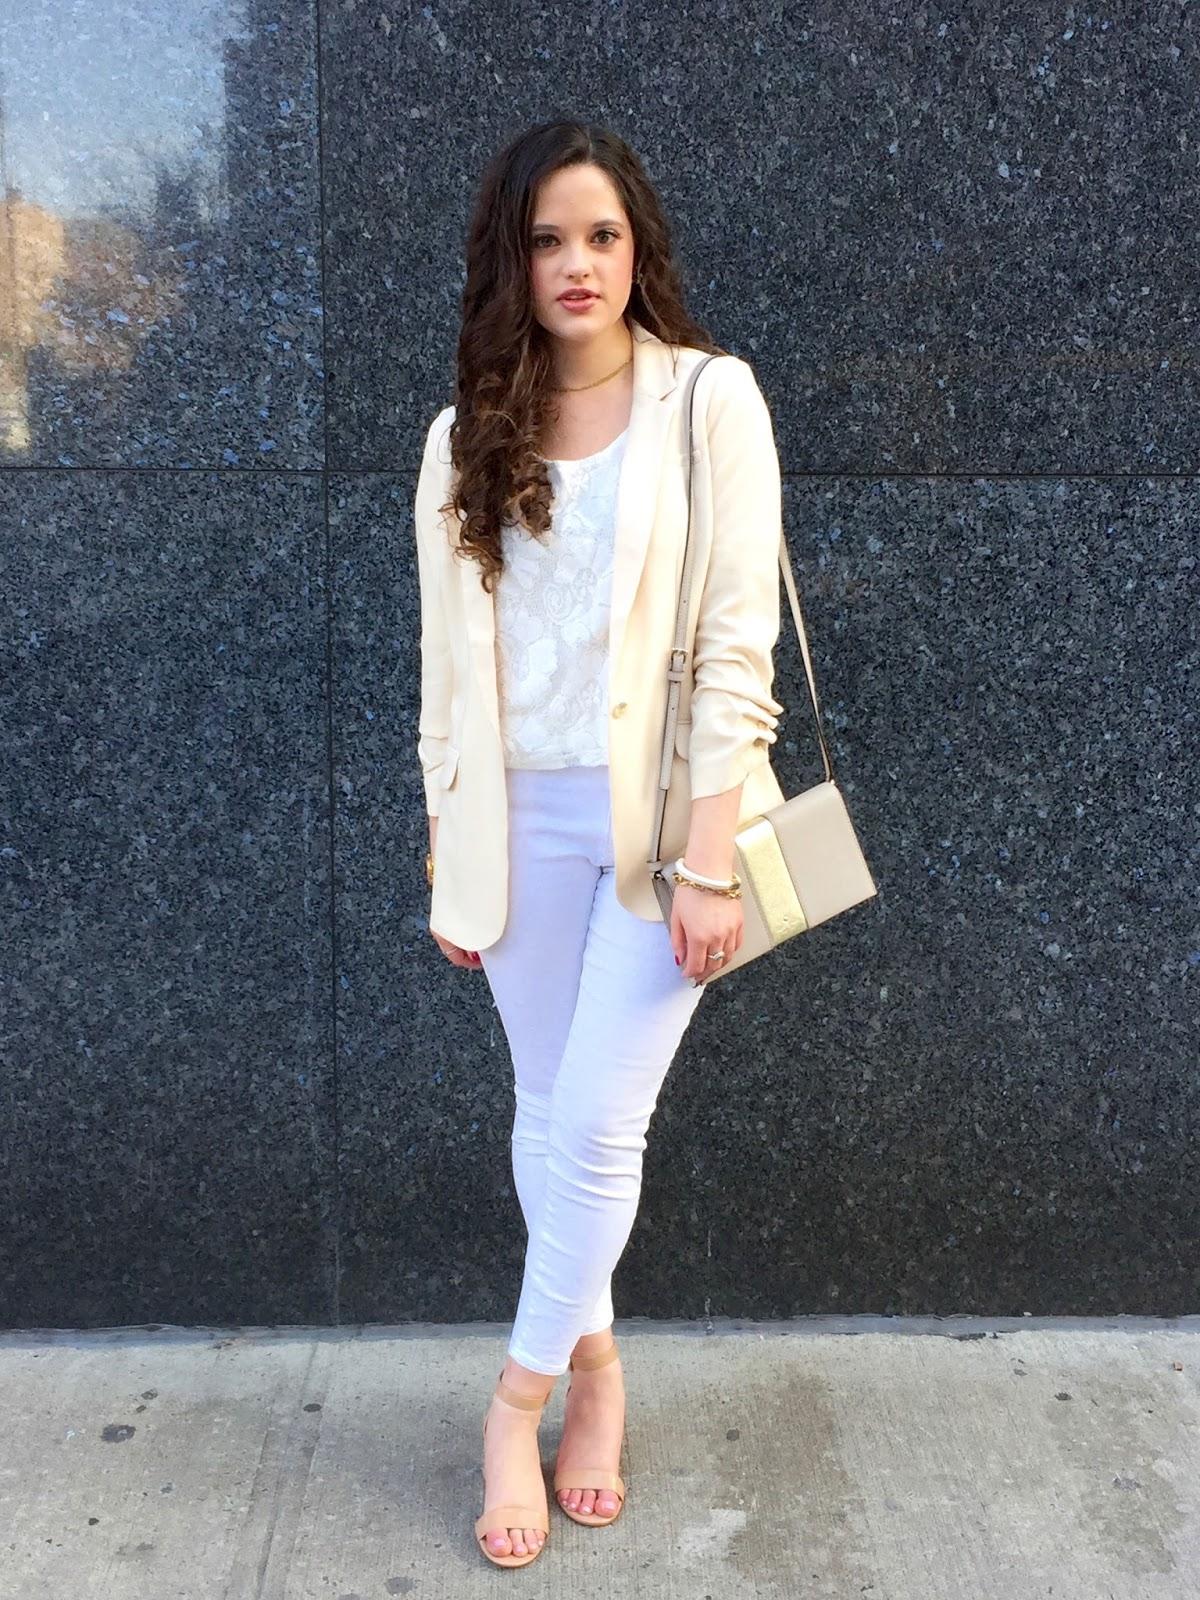 monochrome white outfit